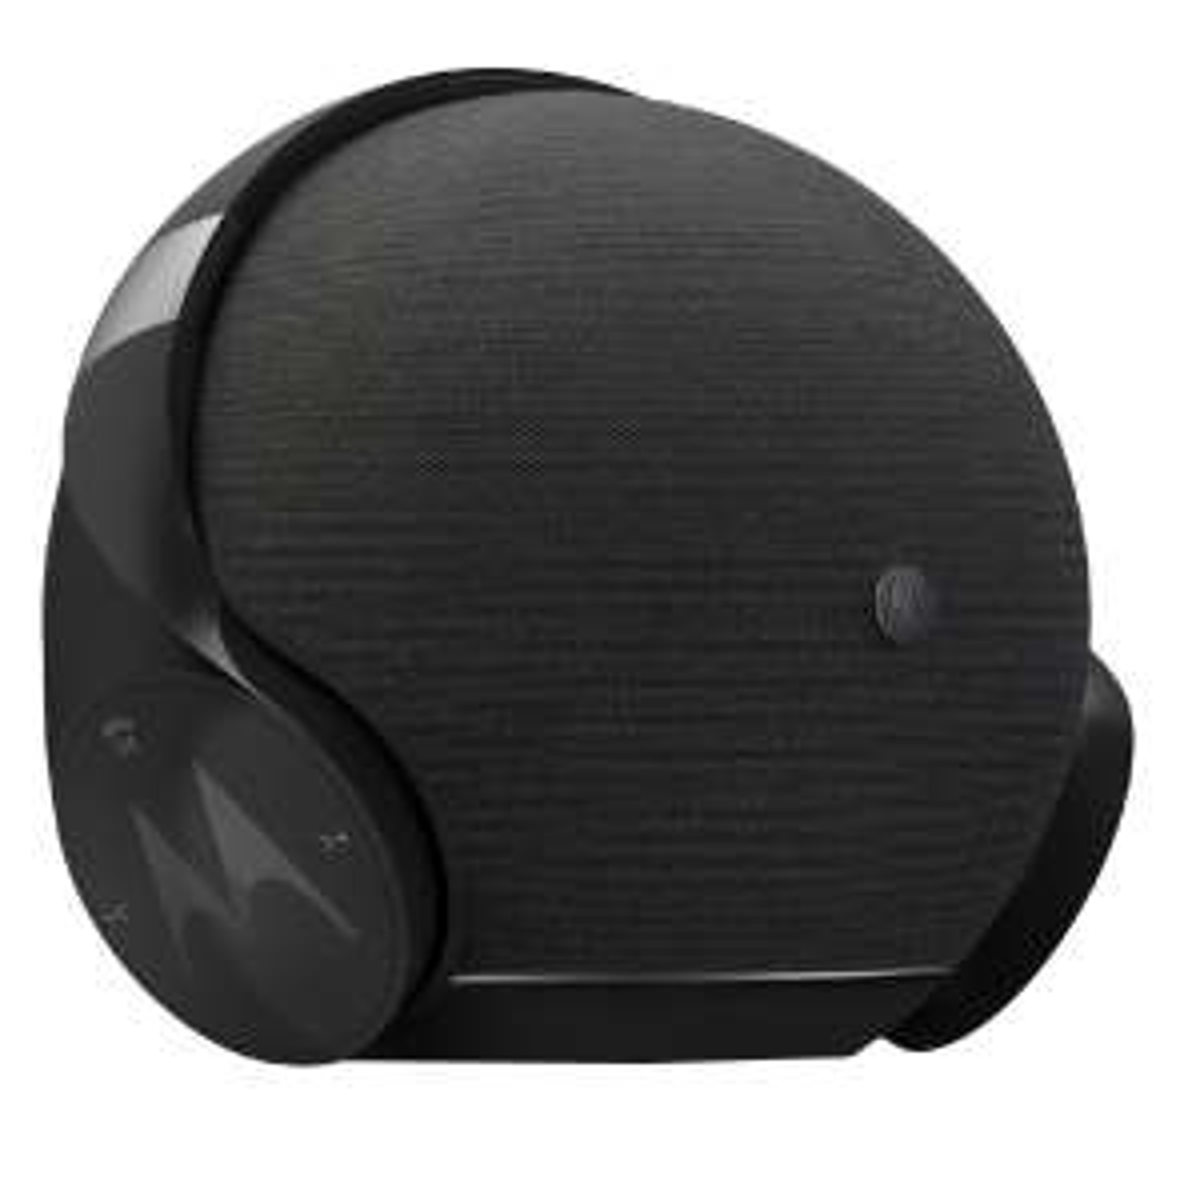 Motorola Bluetooth Speaker and Wireless Headphones 2-in-1 - £26.99 @ Robert Dyas (Free C&C)